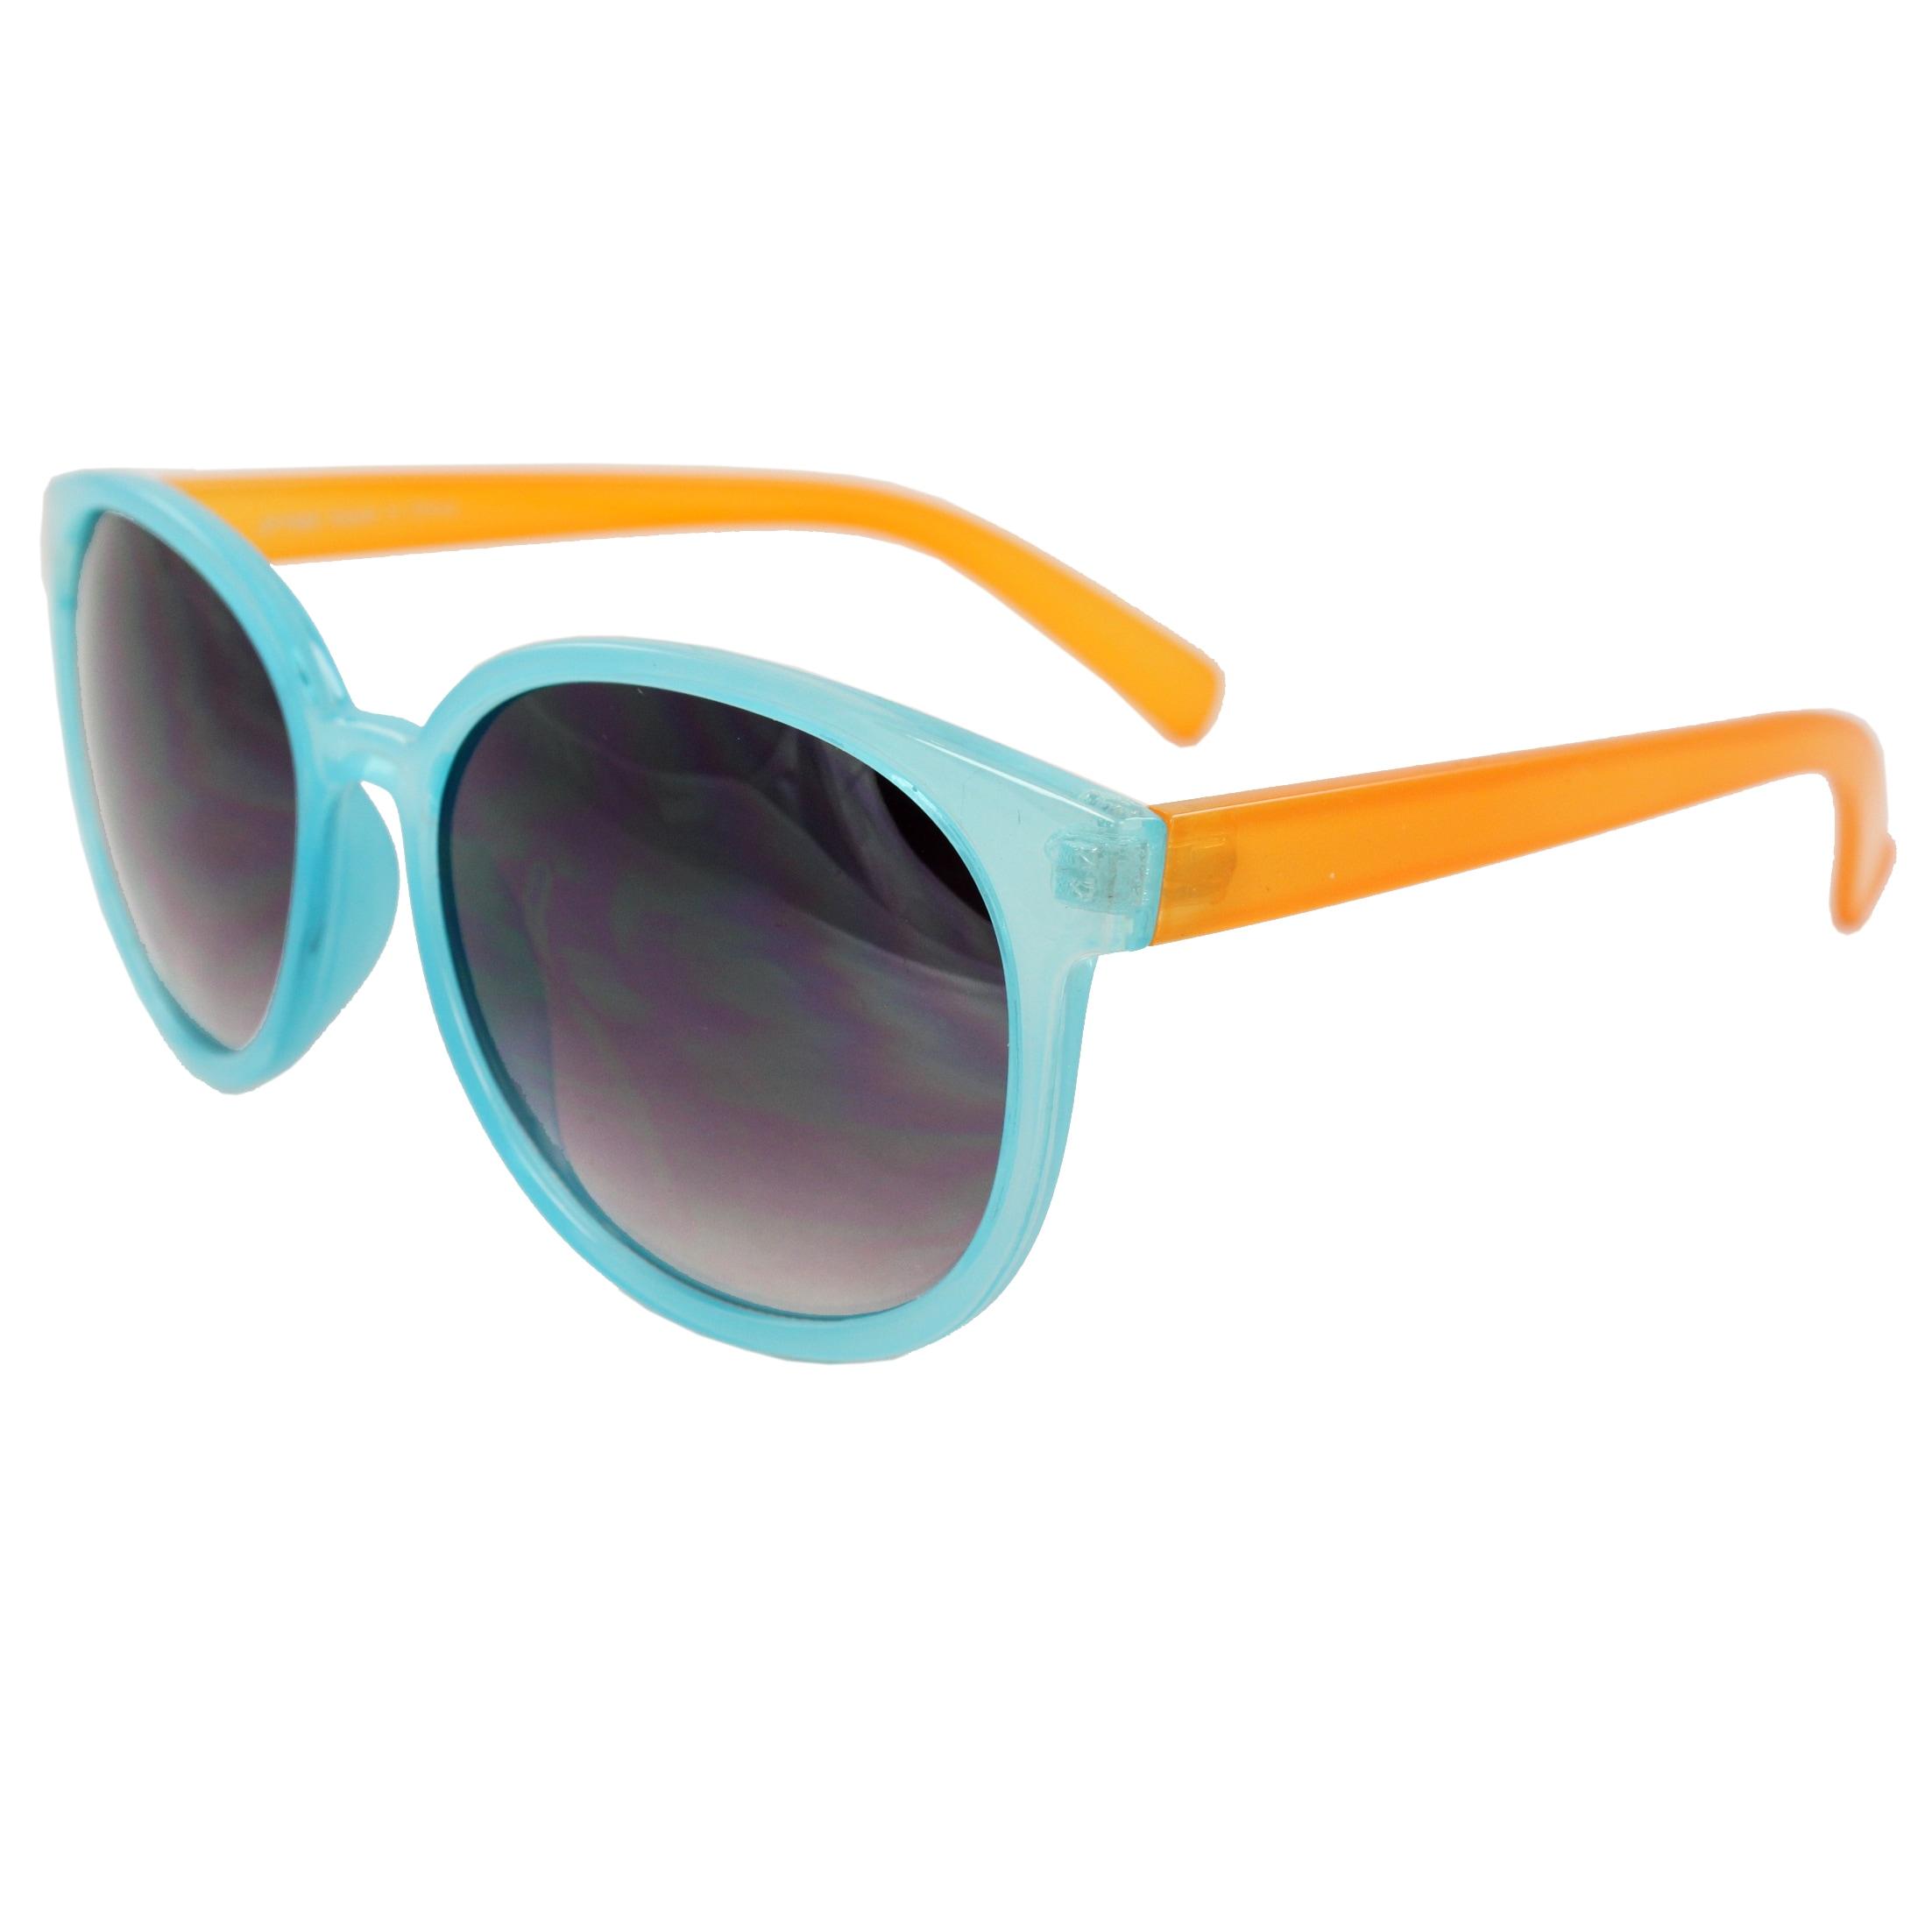 Women's Blue/ Orange Oval Fashion Sunglasses